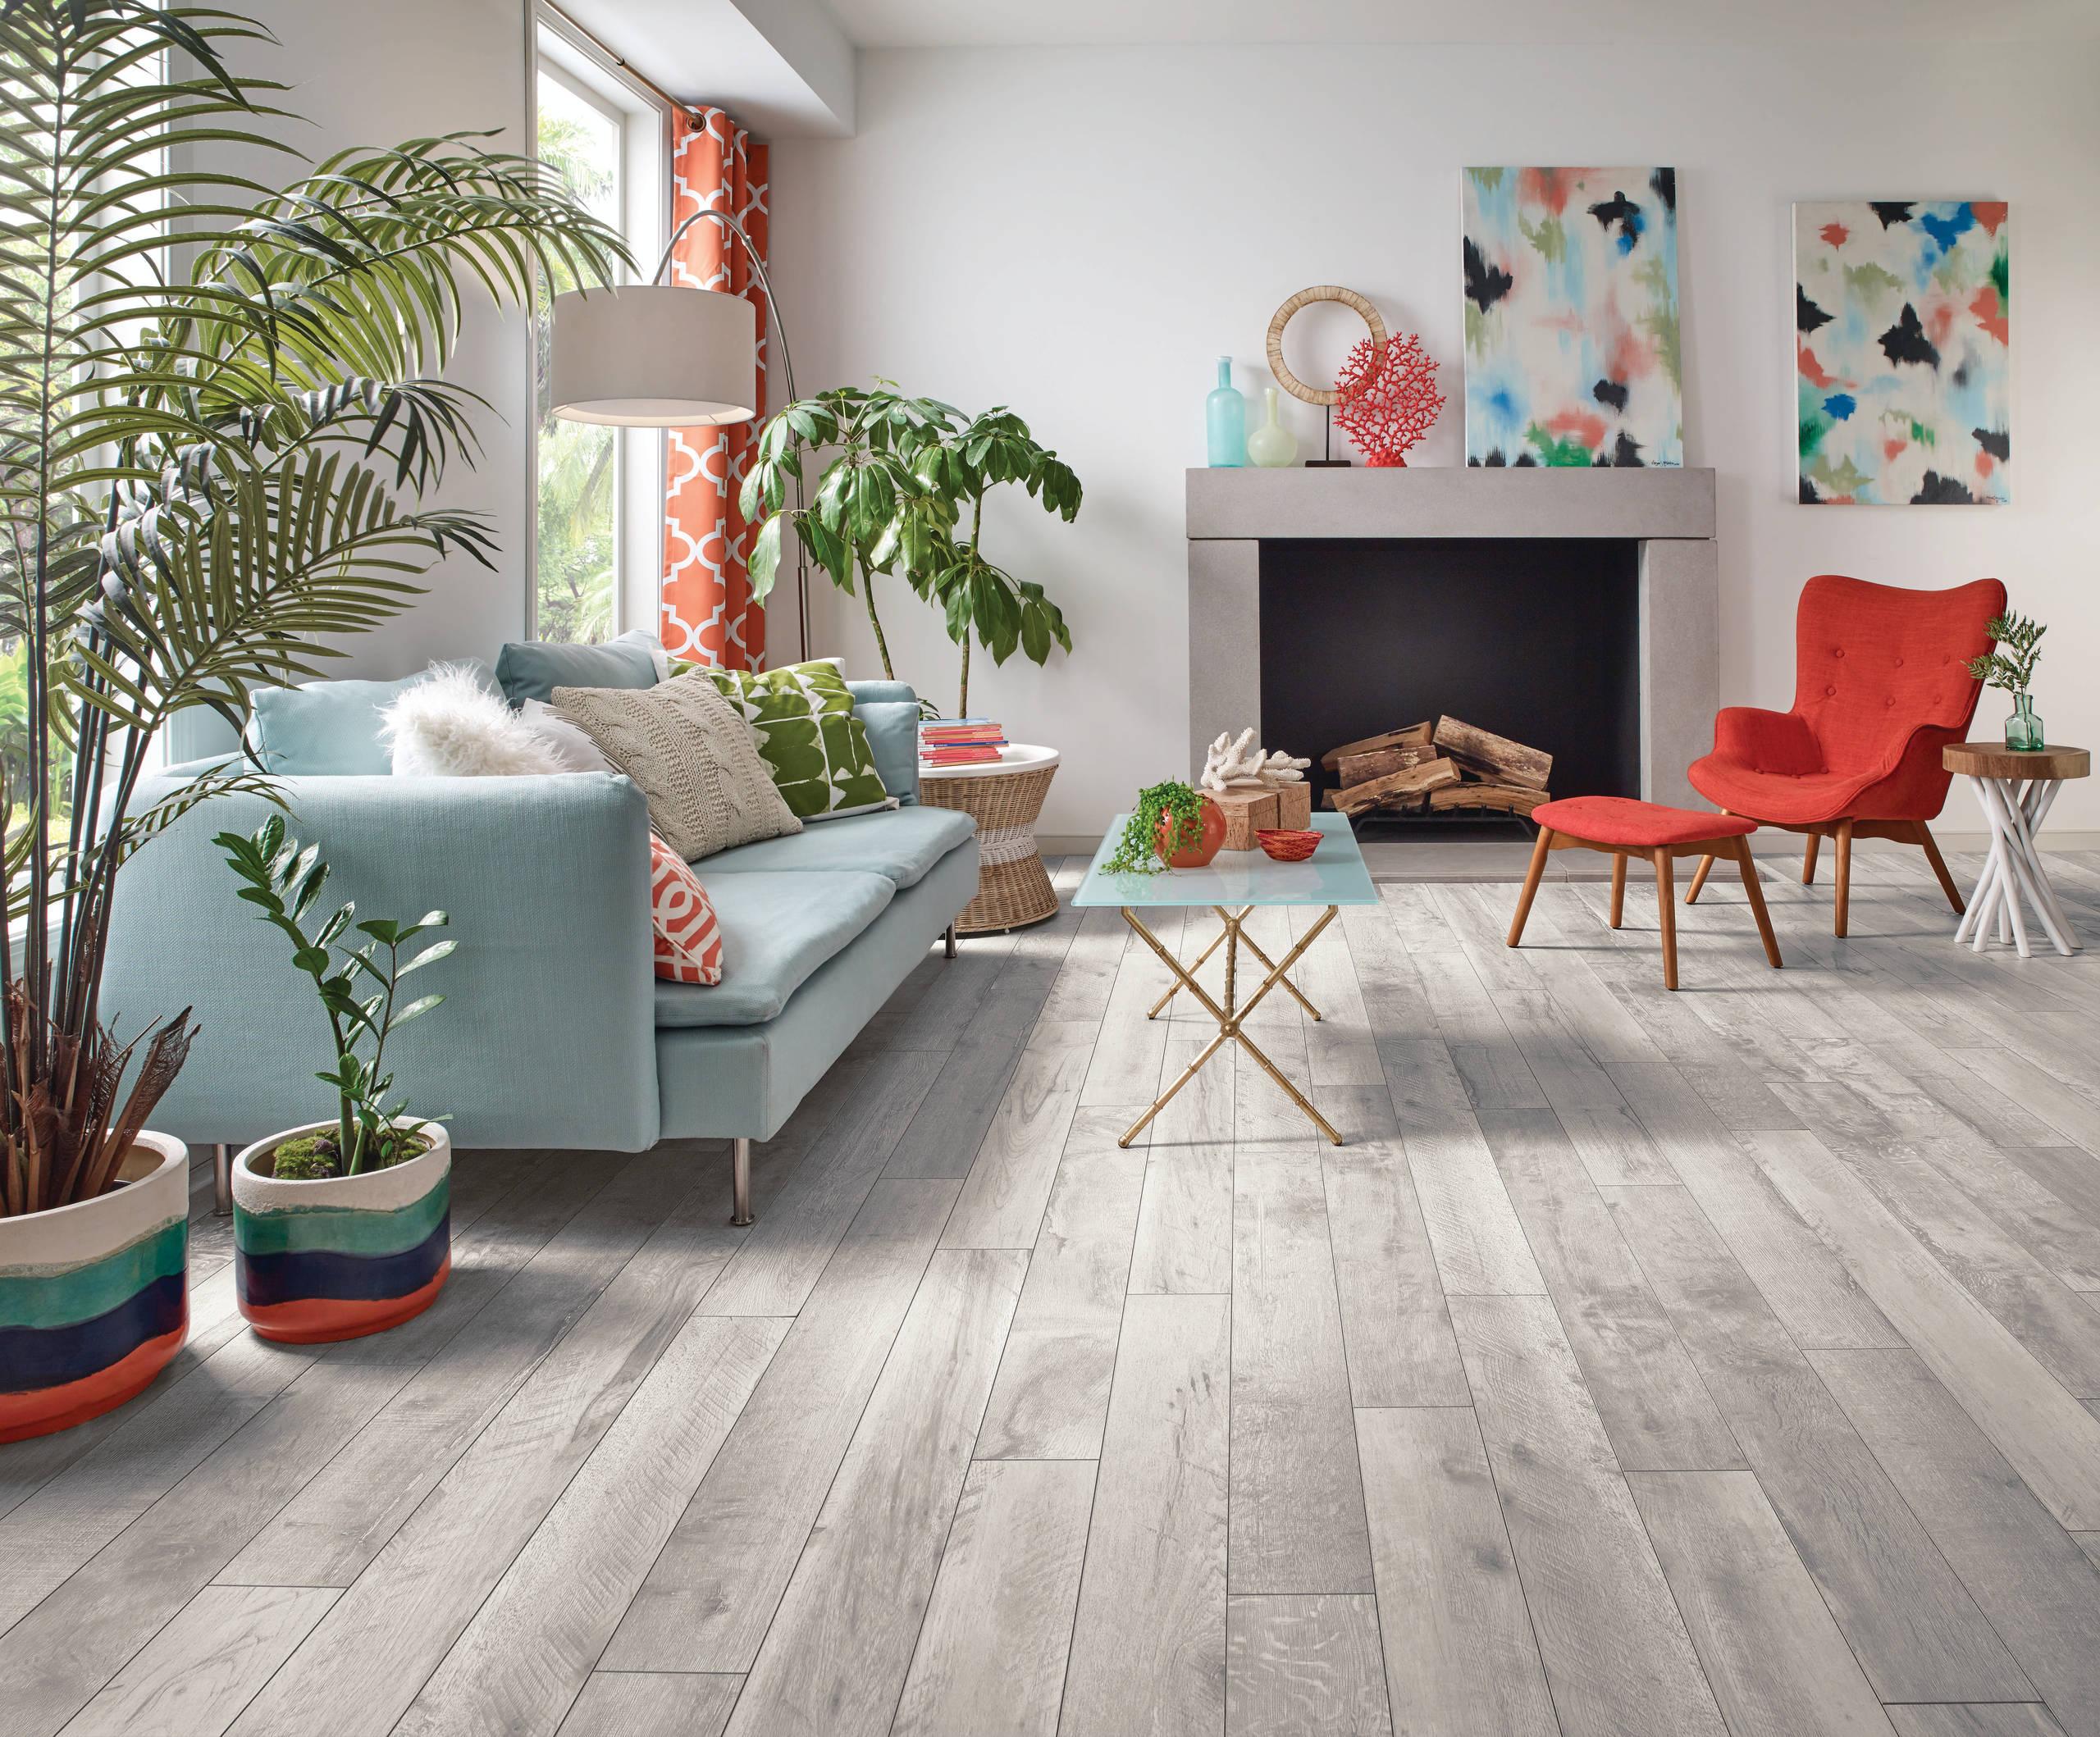 75 Beautiful Vinyl Floor Living Room, Lino Flooring In Living Room